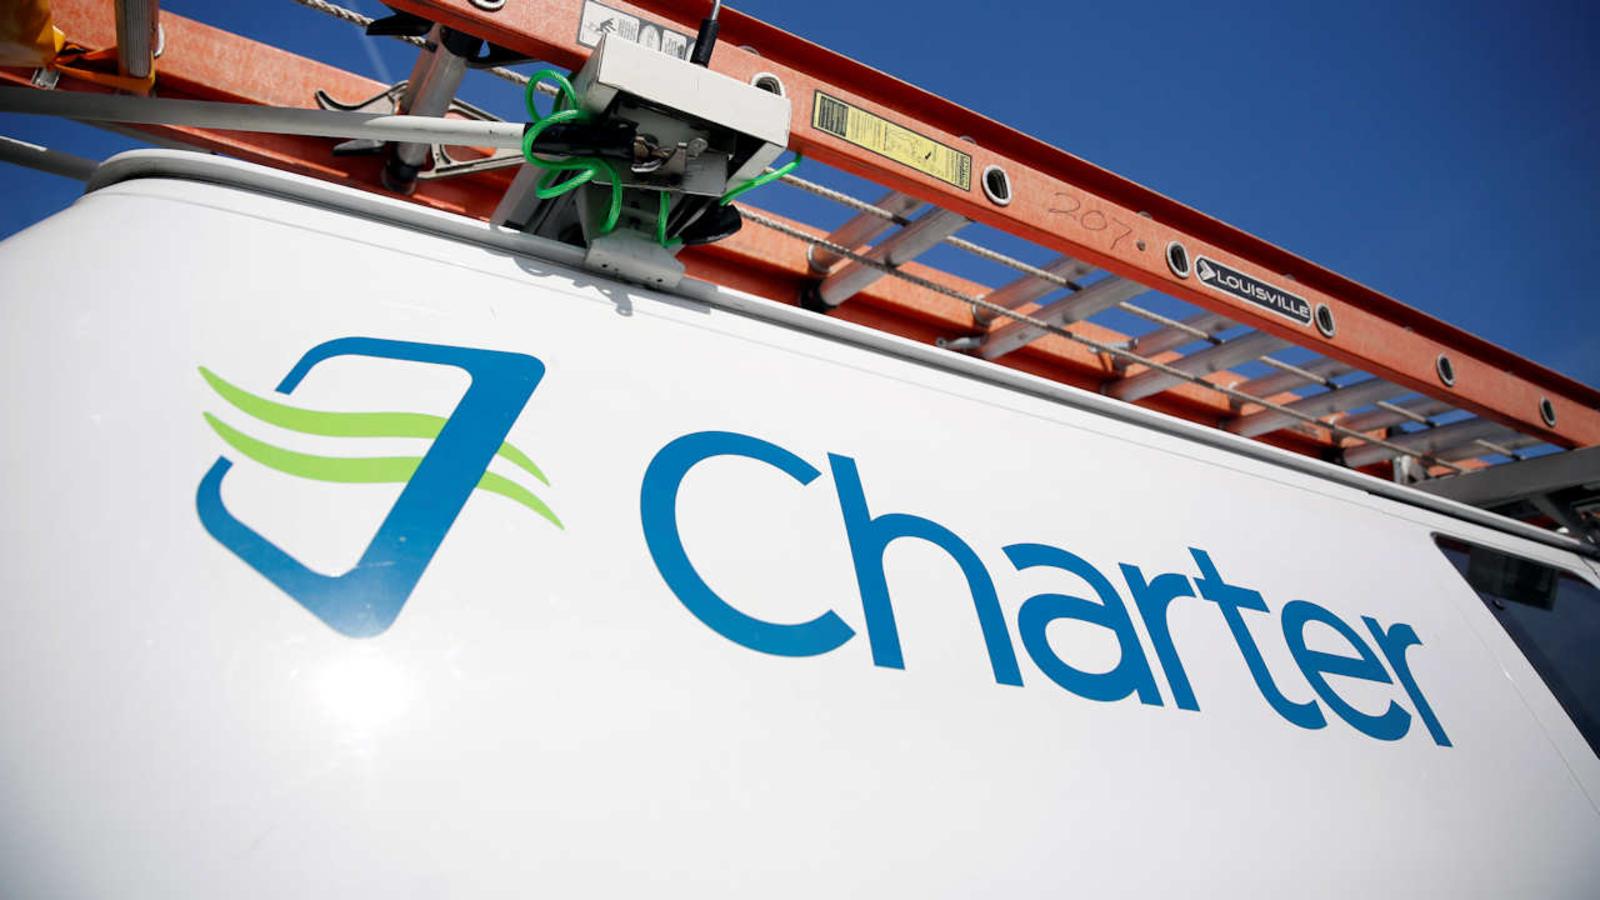 Coronavirus: Charter, Comcast offer 60 days of free ...